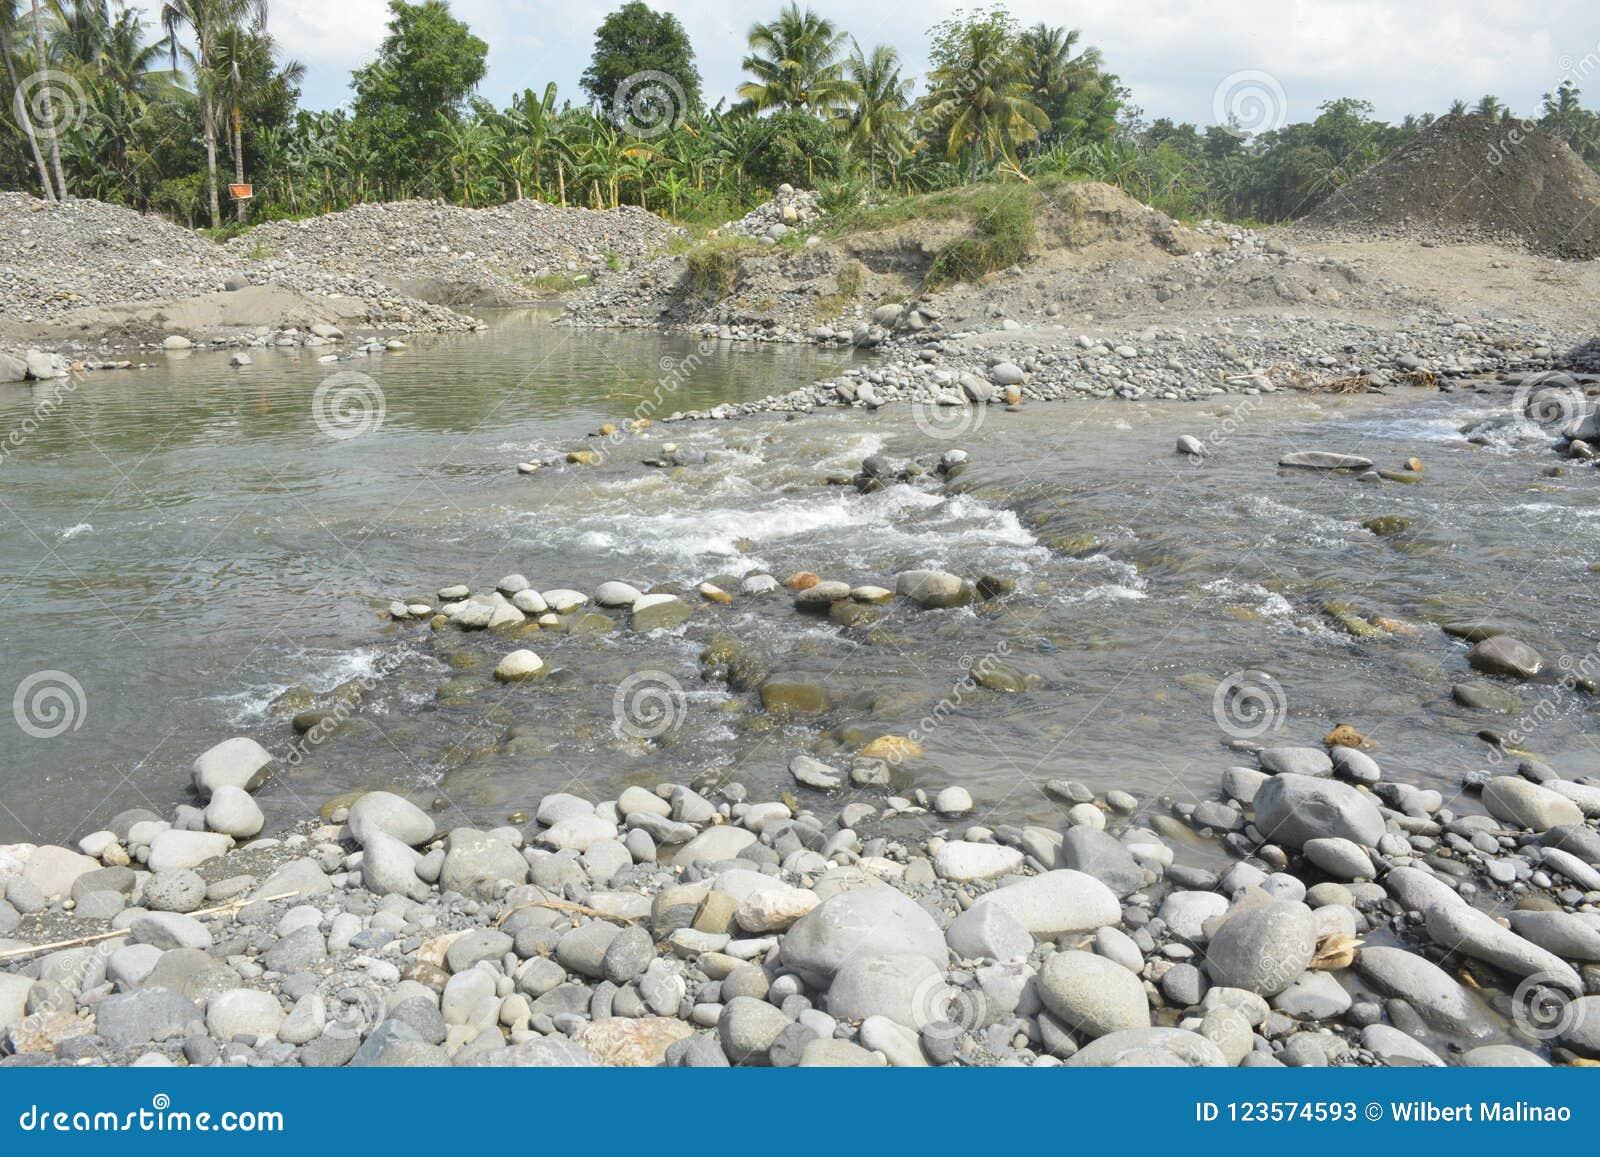 Mal河, Matanao,南达沃省,菲律宾河床